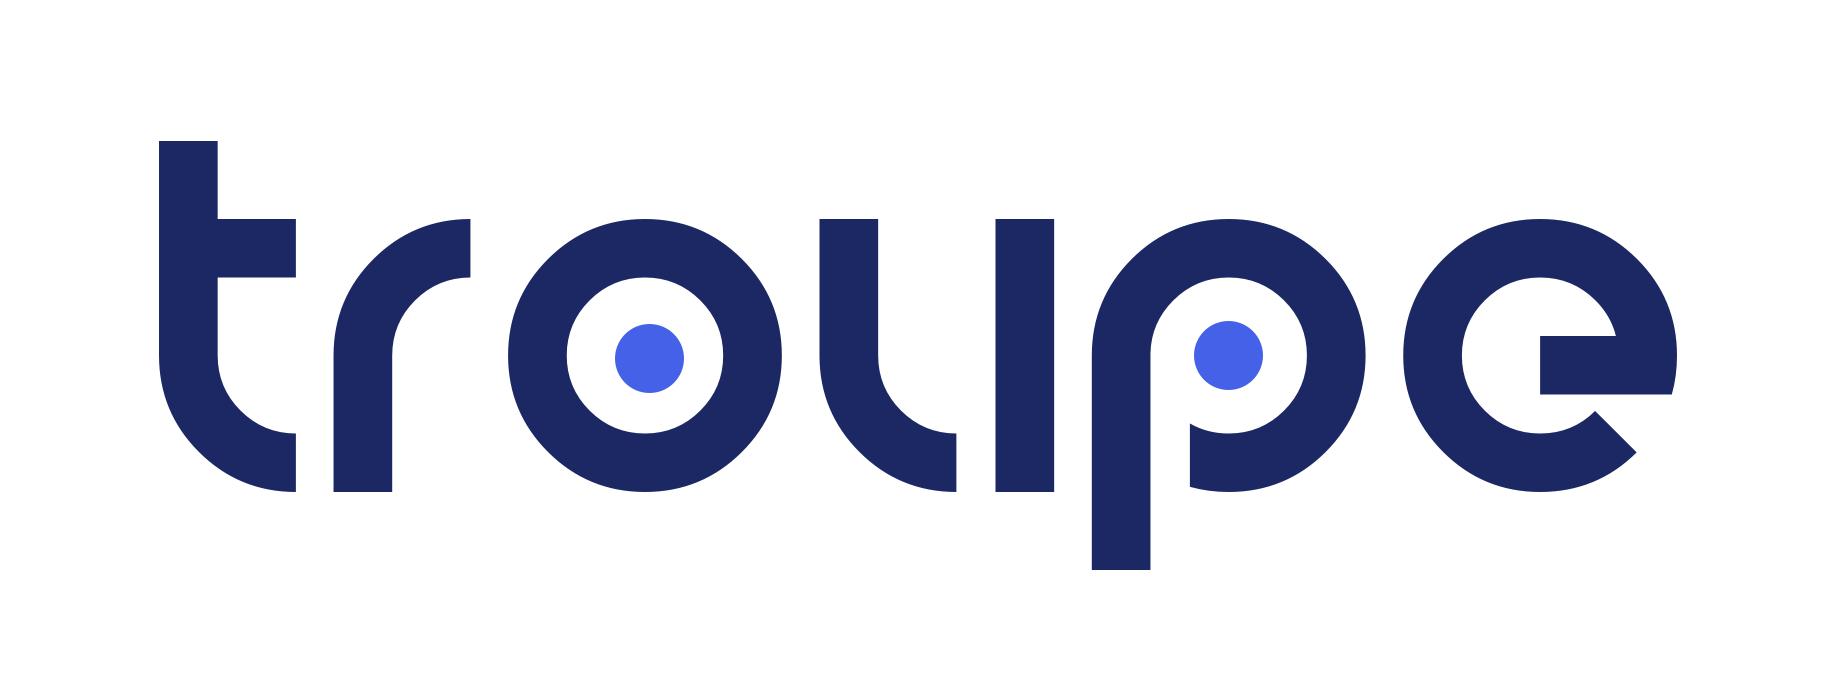 Finalized Troupe logo